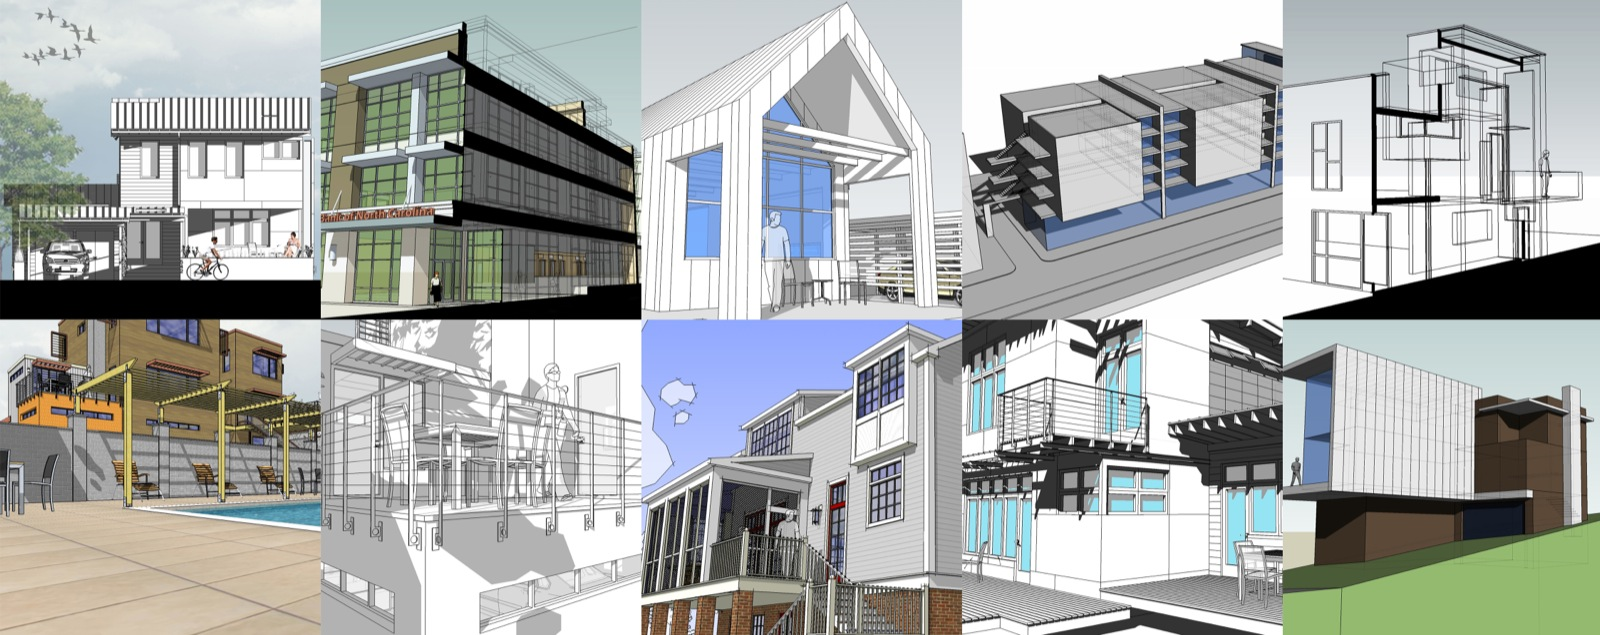 2014-01-14_blog_image_sketchup_collage.jpg